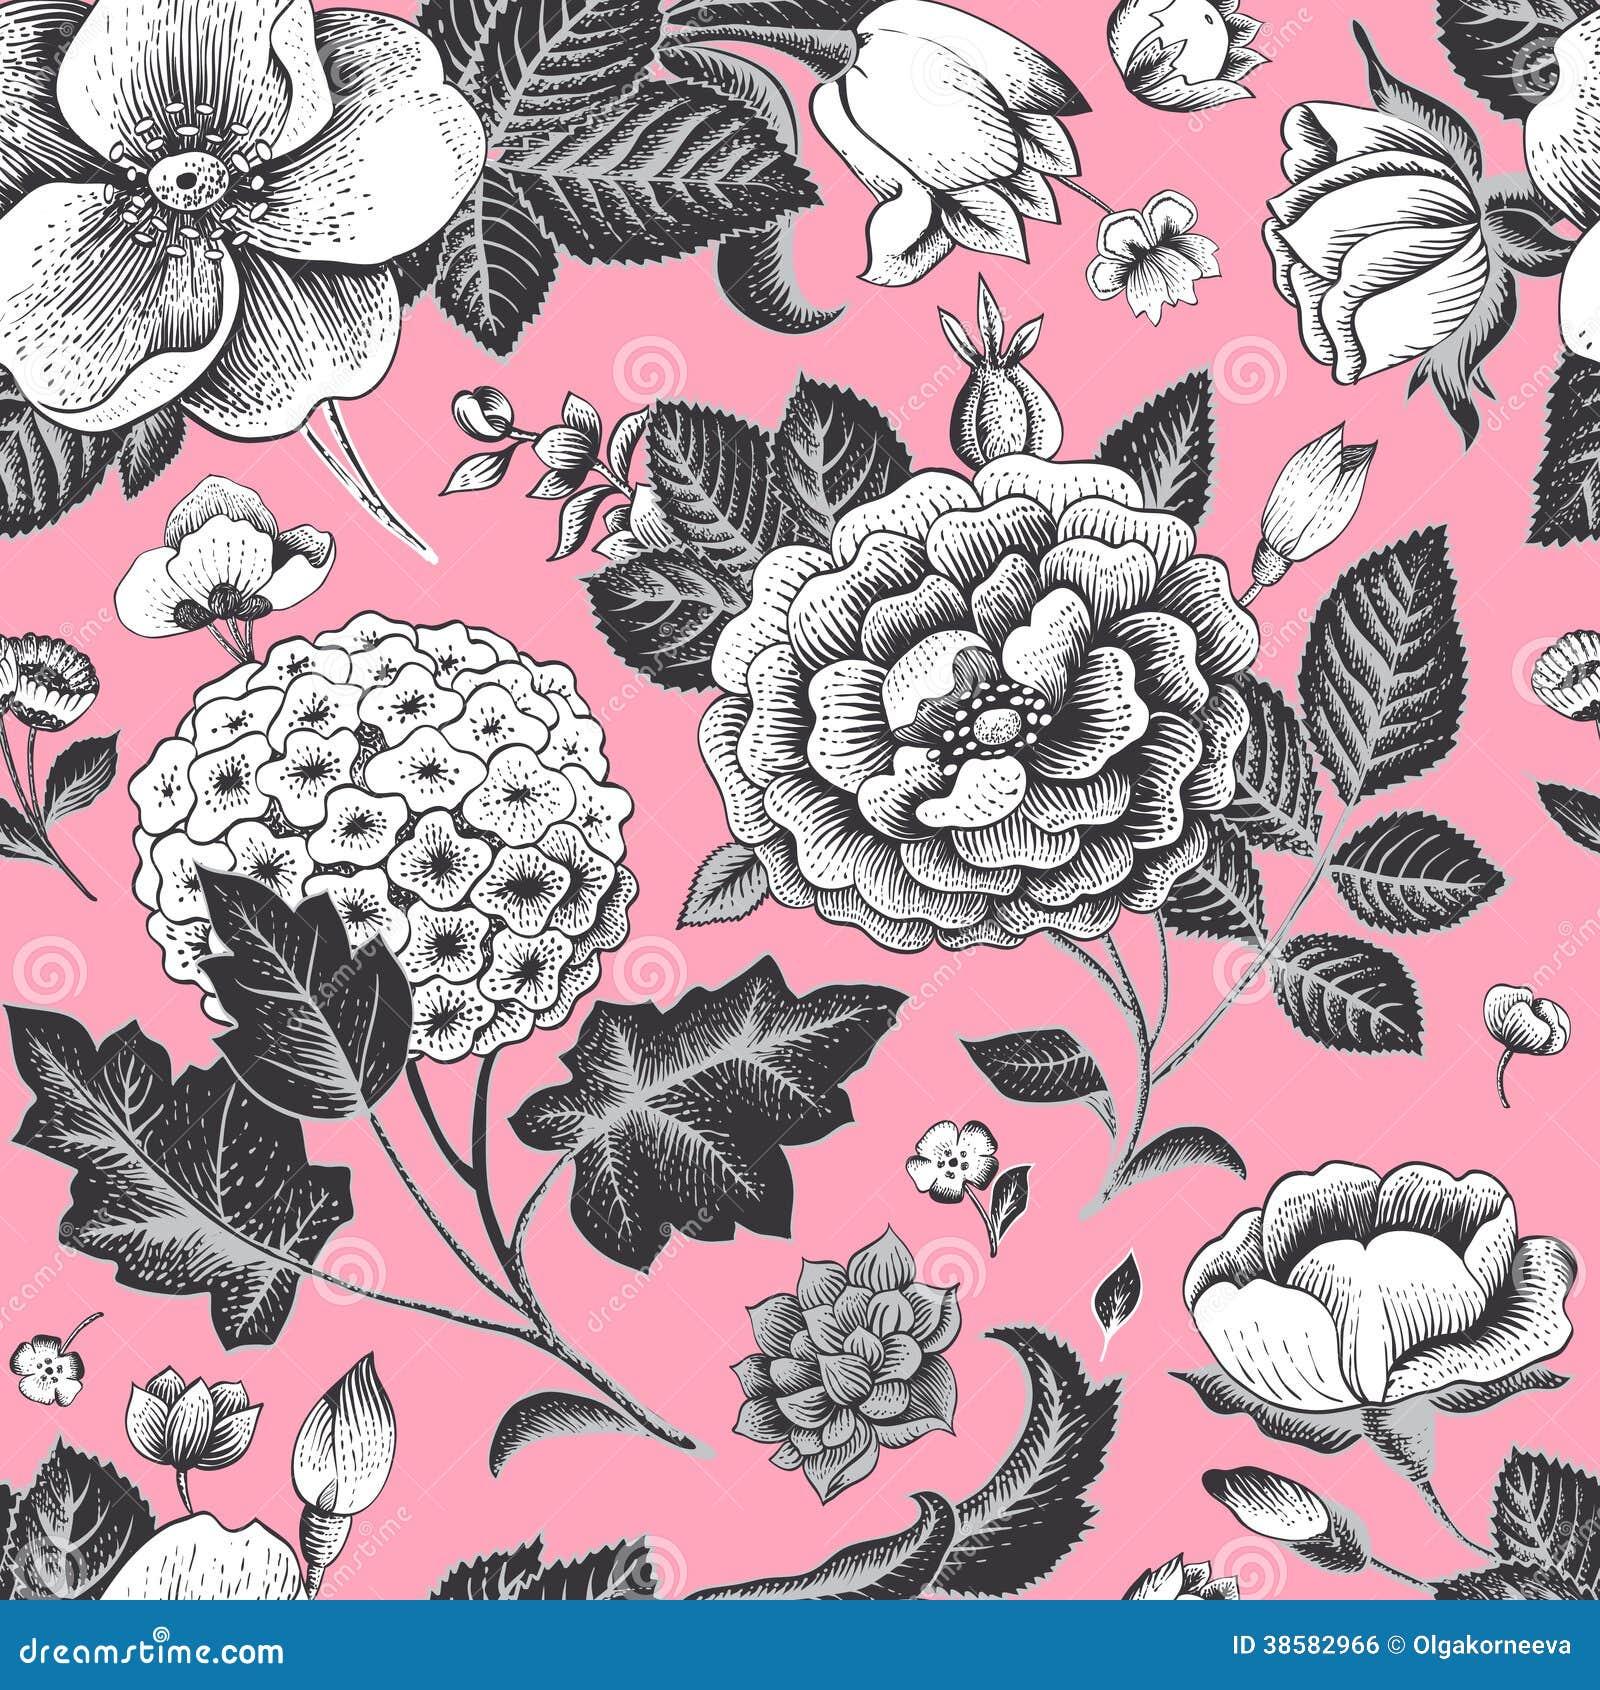 Beautiful vintage floral seamless pattern.